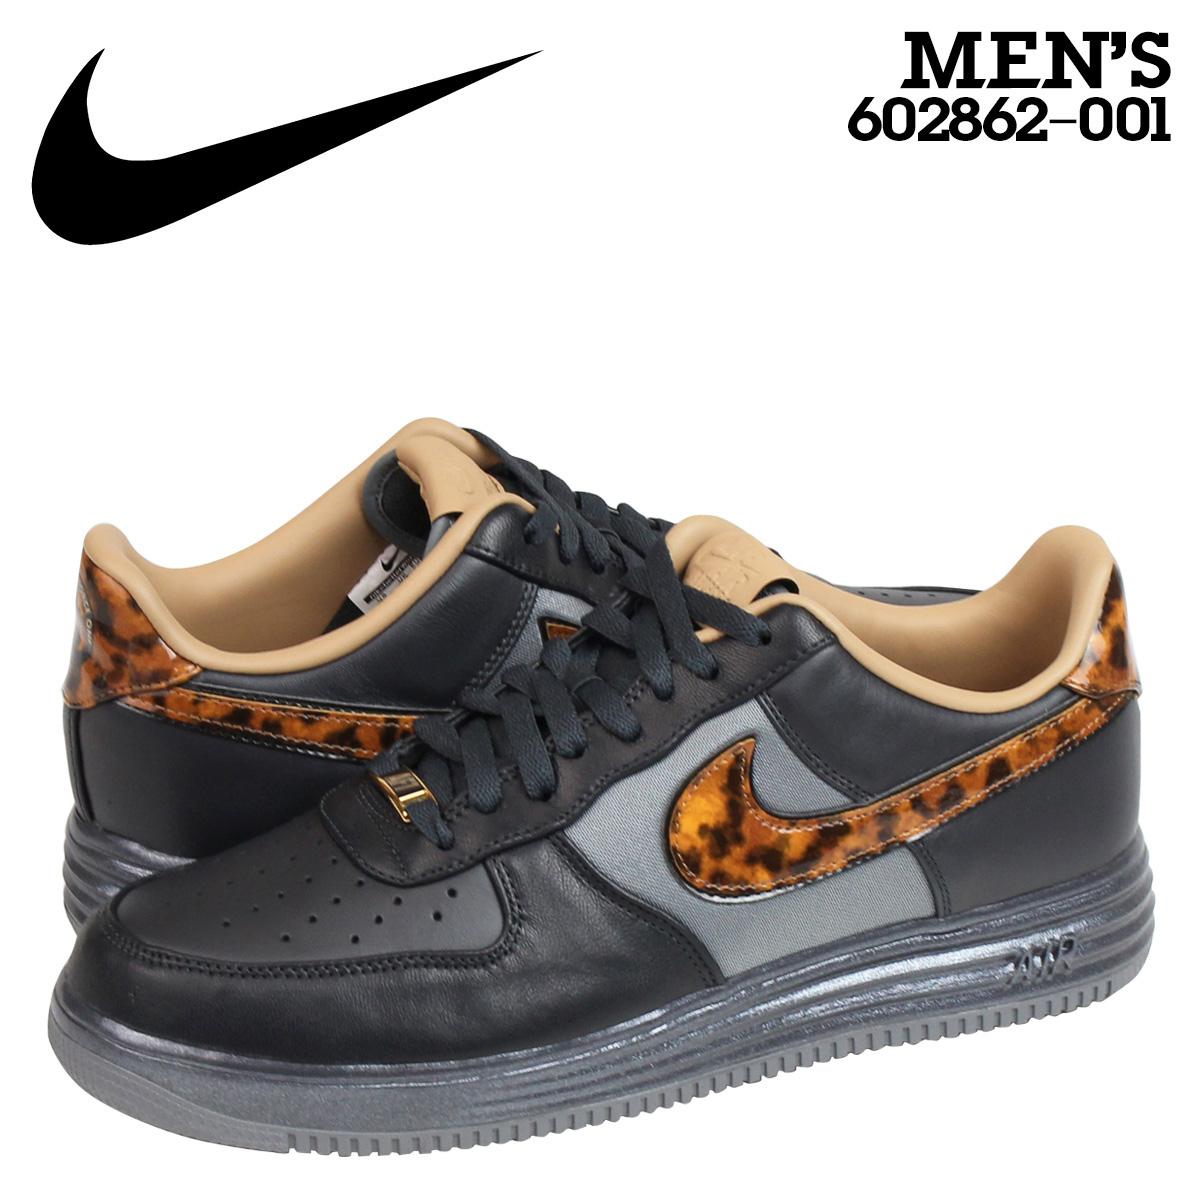 Goods Lab: NIKE Nike luna force sneakers LUNAR FORCE 1 CITY QS